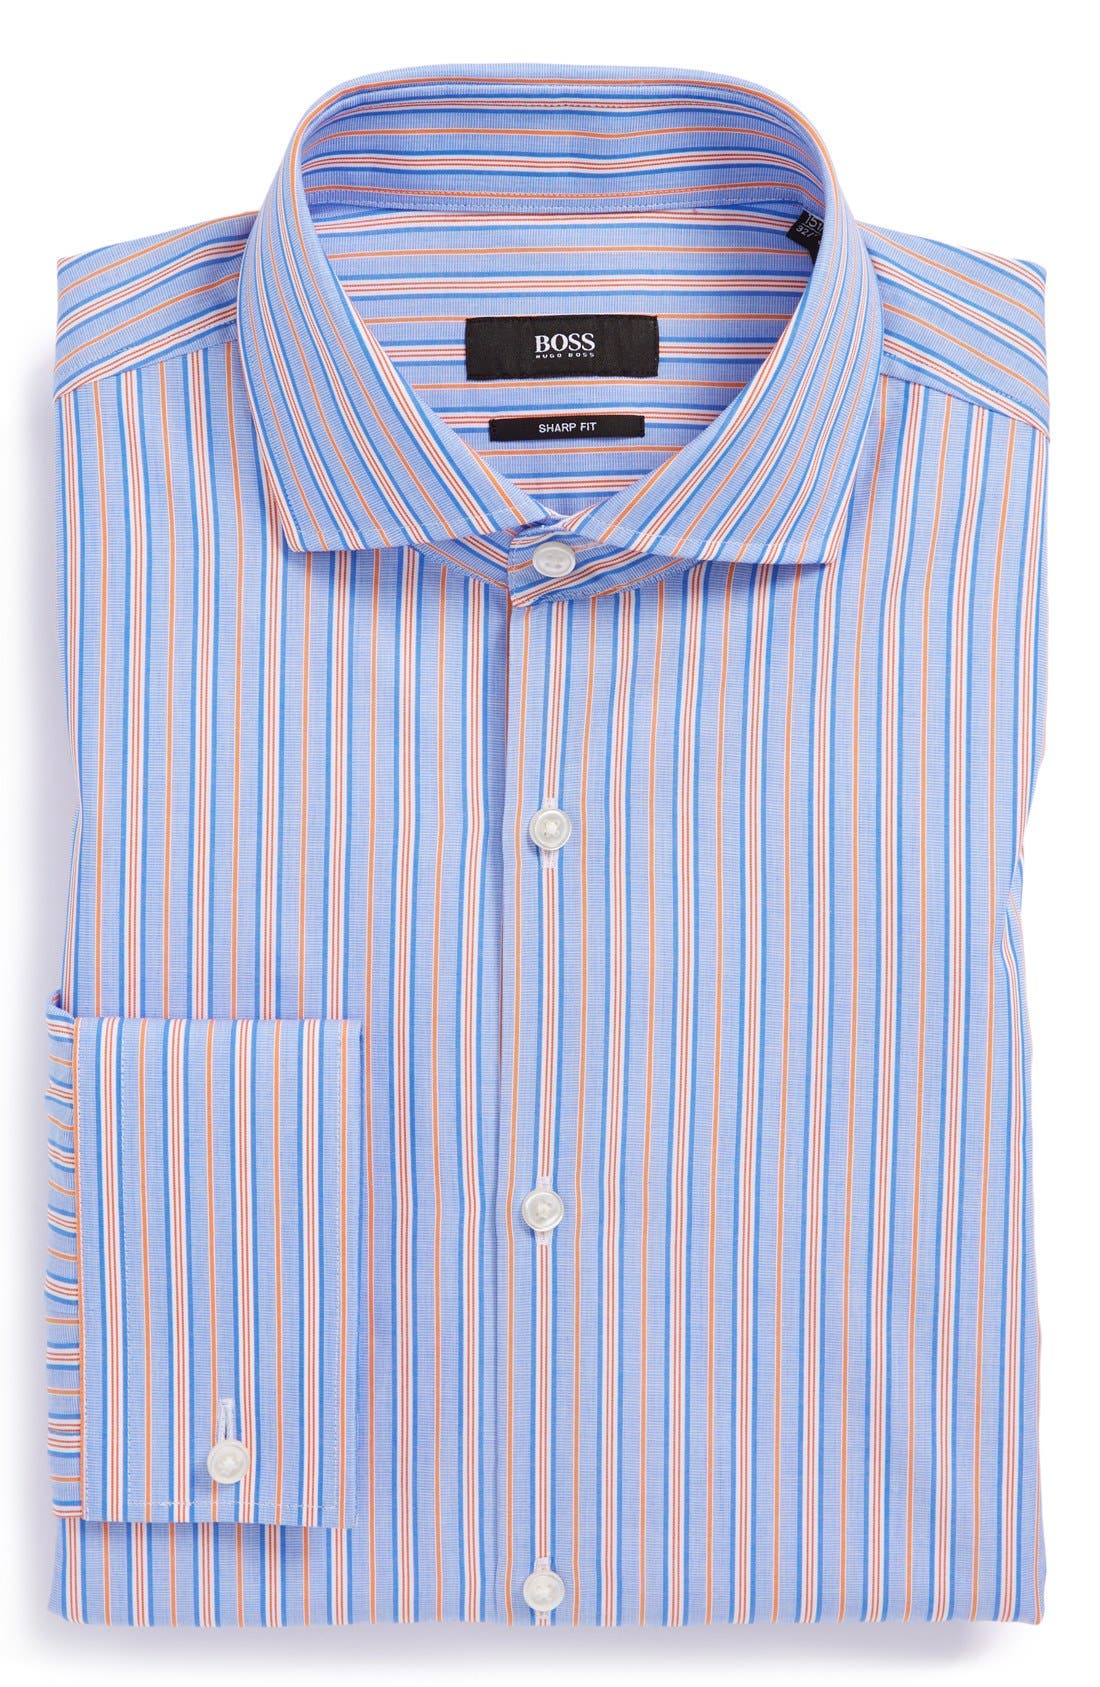 Alternate Image 1 Selected - BOSS HUGO BOSS 'Maison' Sharp Fit French Cuff Stripe Dress Shirt